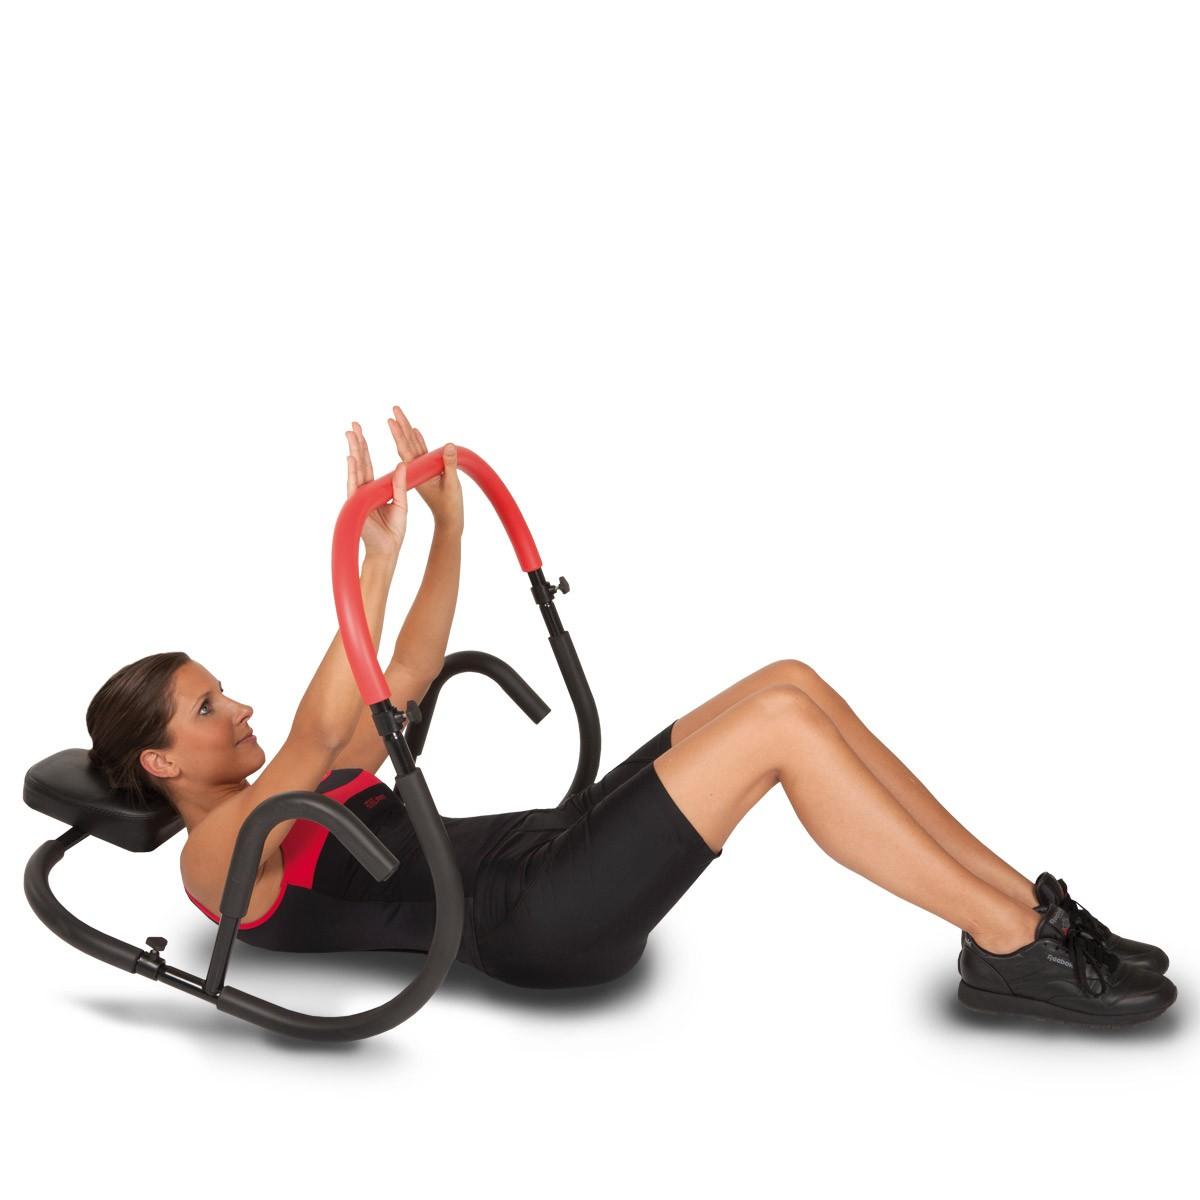 HAMMER Bauchtrainer AB-Roller   Hammer-Fitness.de